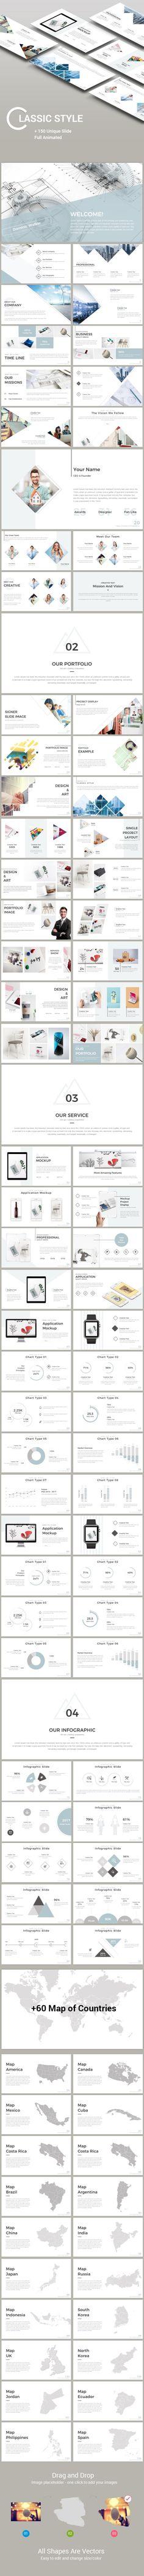 Classic Style Presentation Templates - #PowerPoint Templates Presentation Templates Download here: https://graphicriver.net/item/classic-style-presentation-templates/19973830?ref=alena994